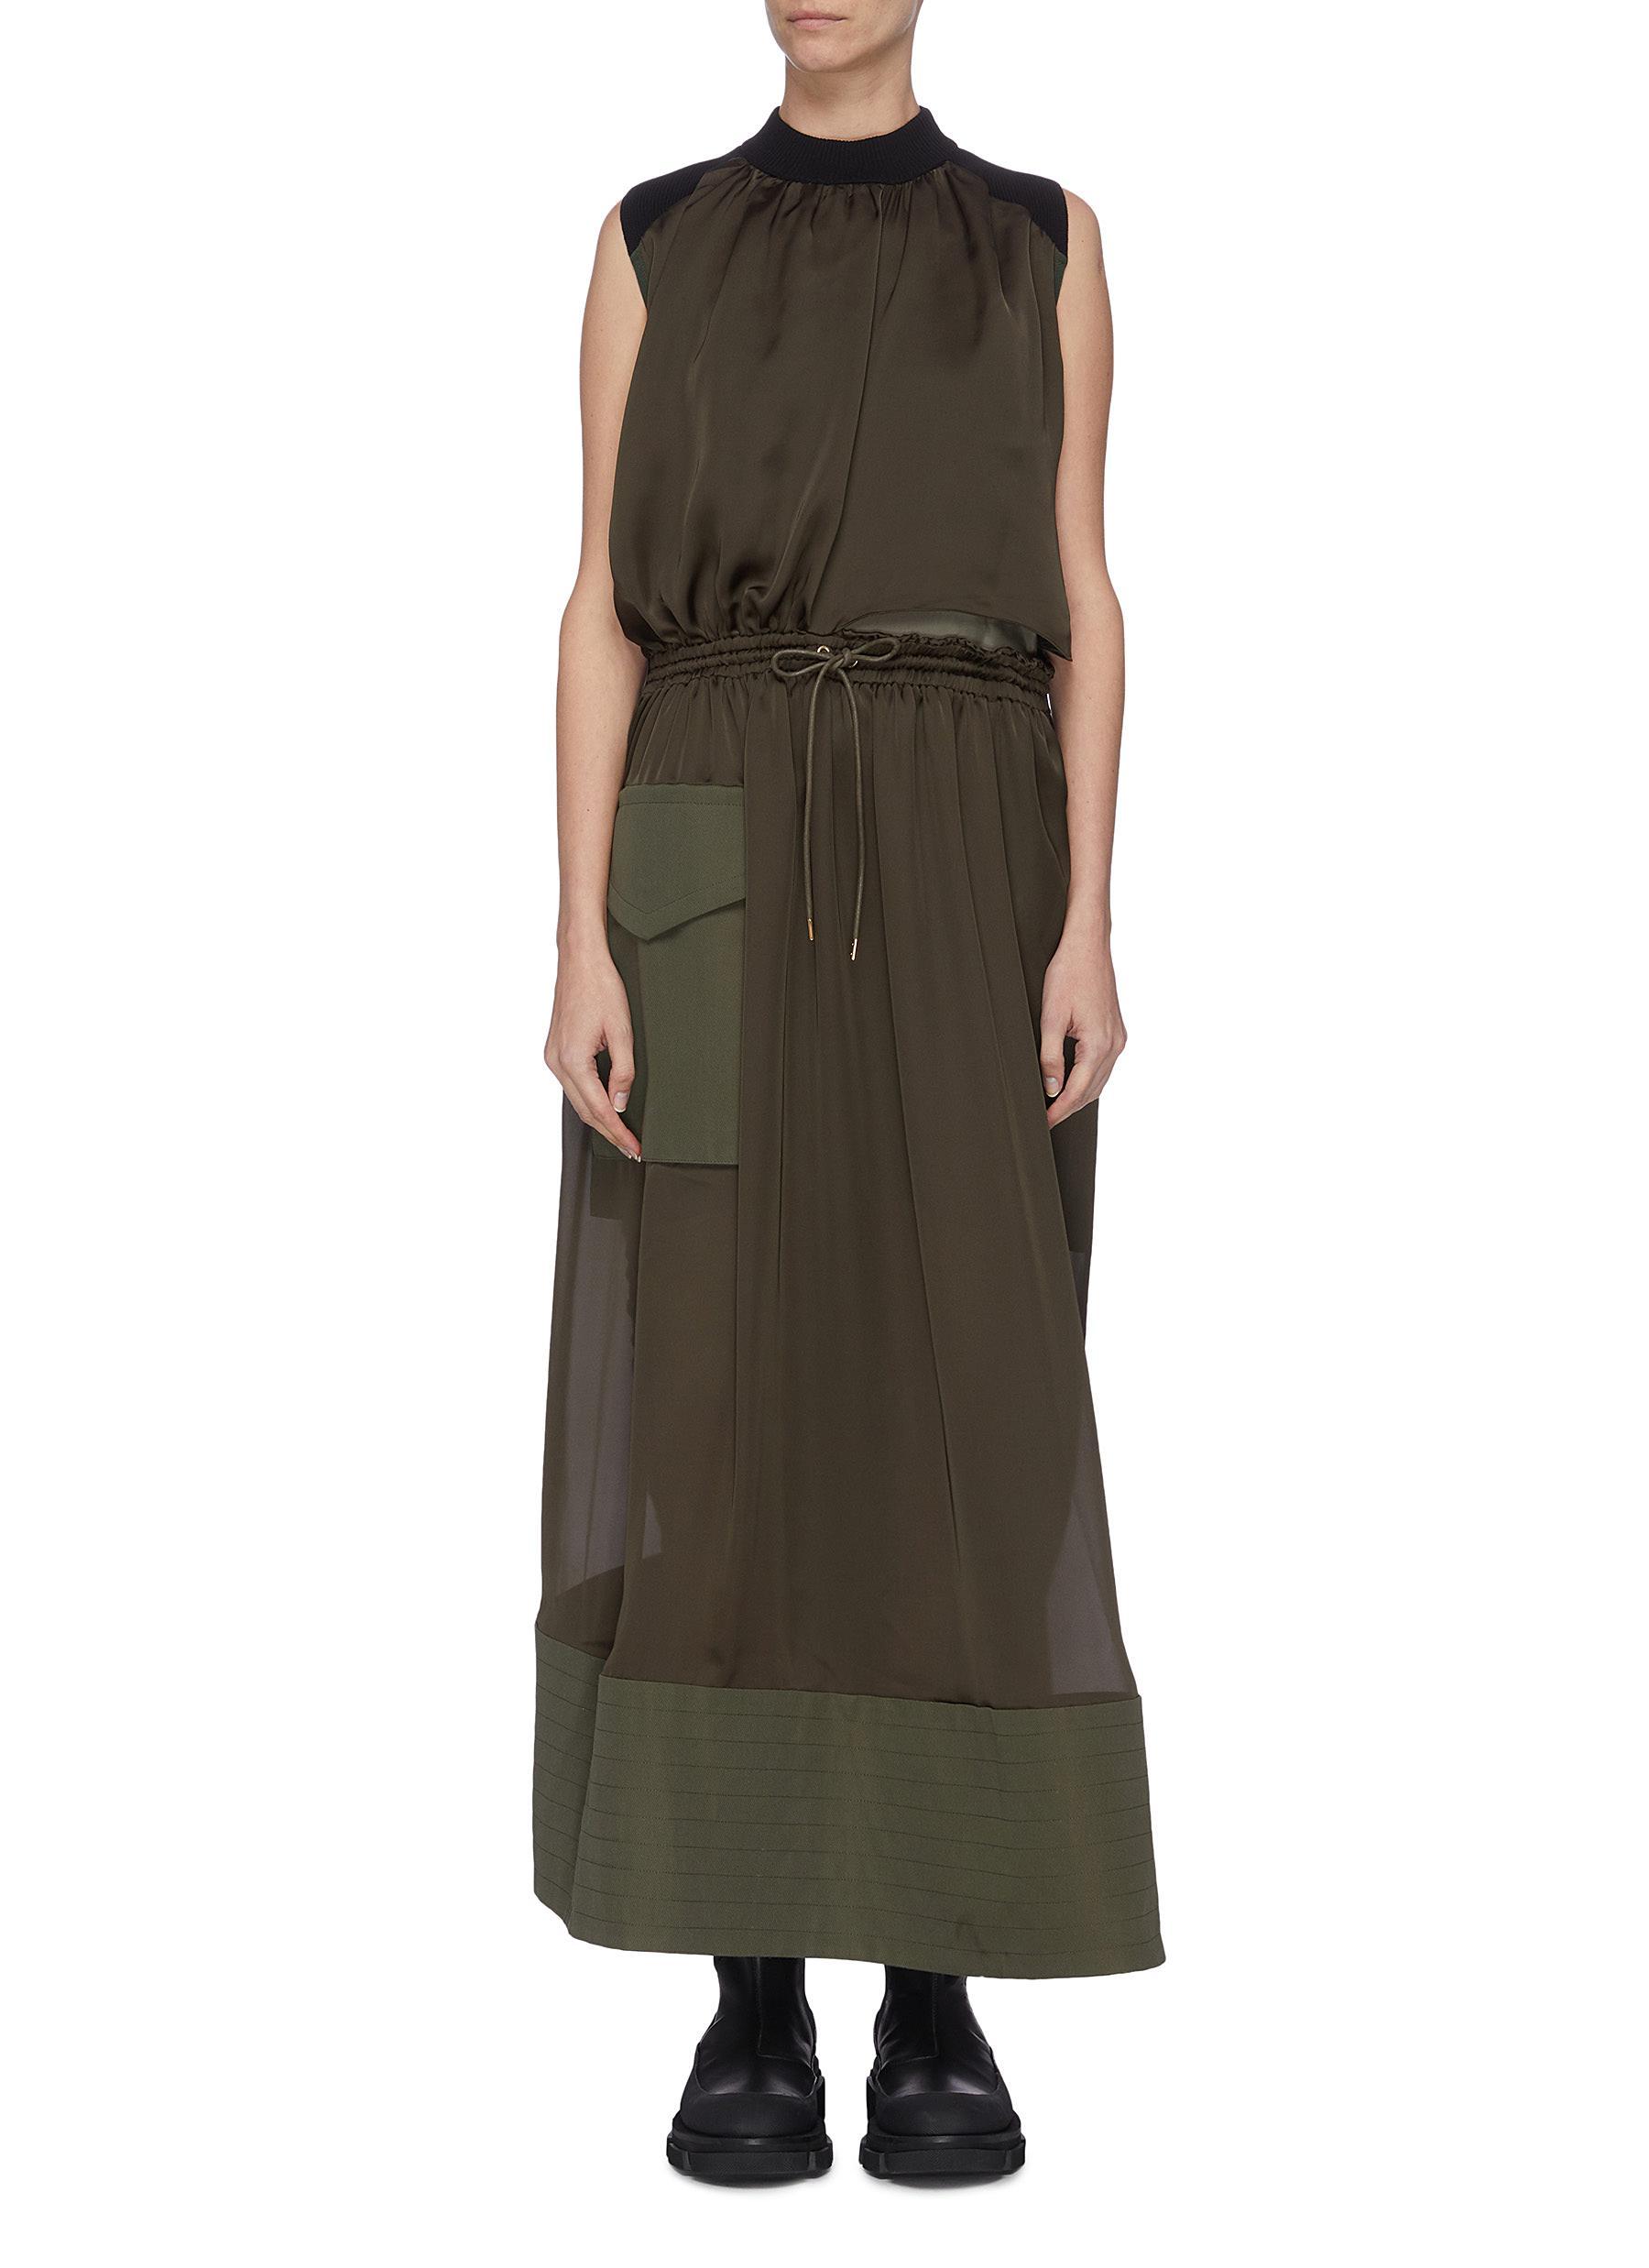 Buy Sacai Dresses Sleeveless panelled dress